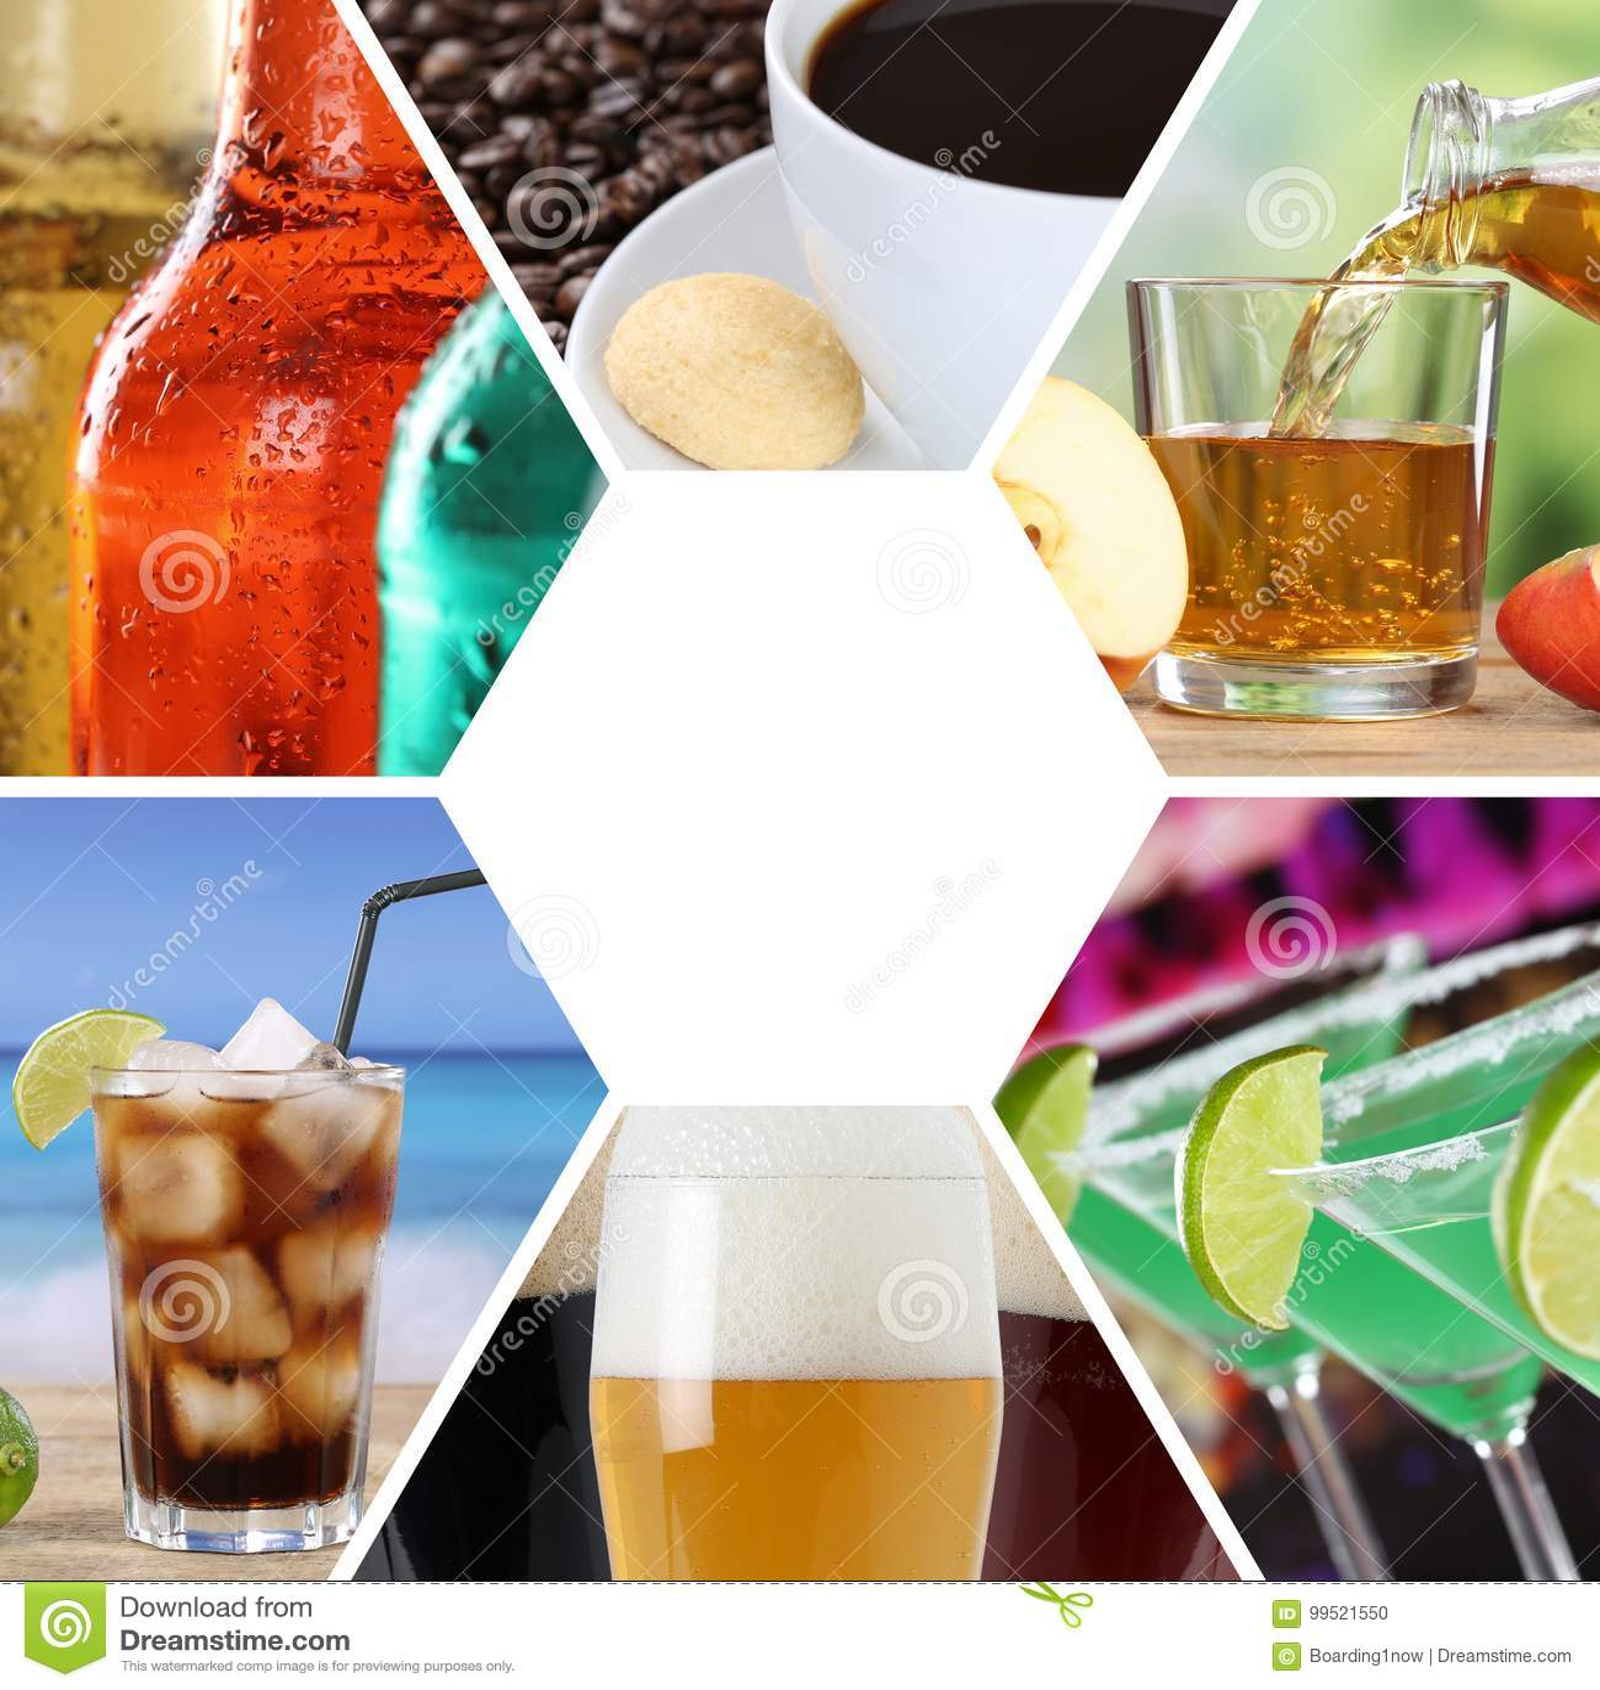 Drink menu collection collage beverages drinks square restaurant